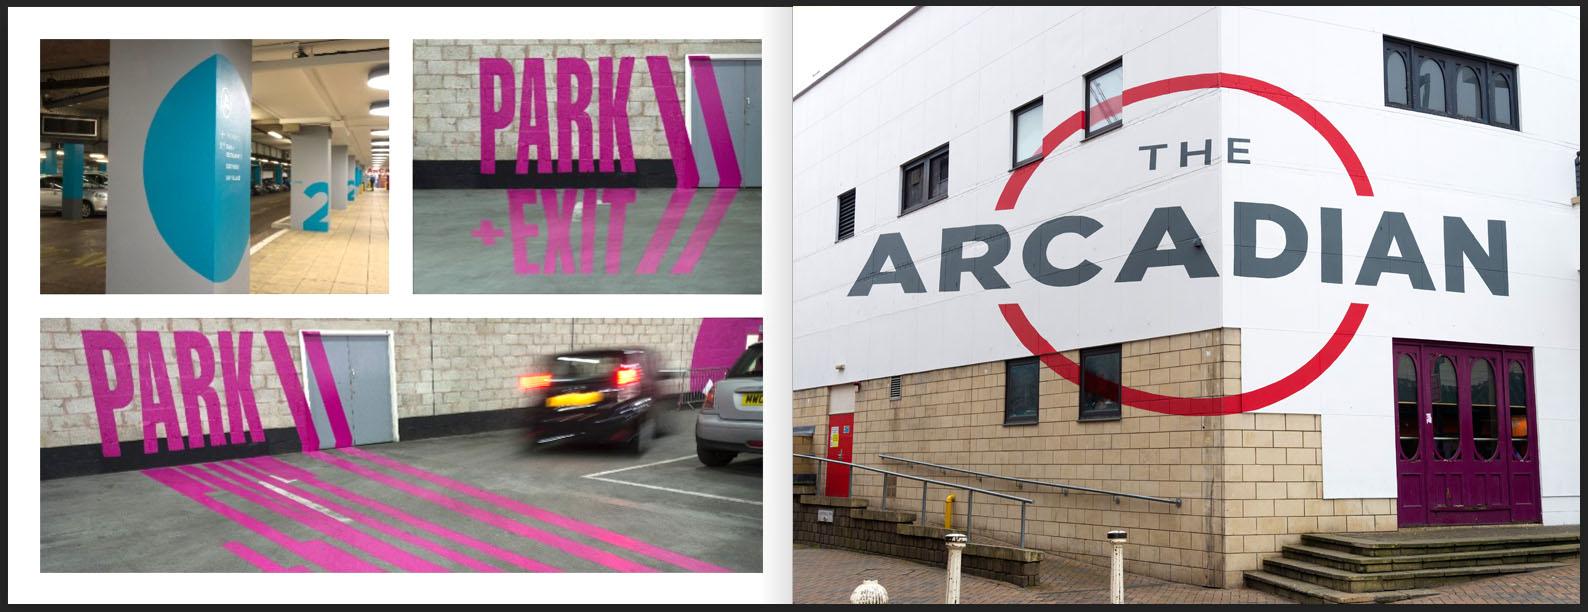 Location photographer Birmingham- Arcadian car park- dpix creative photography